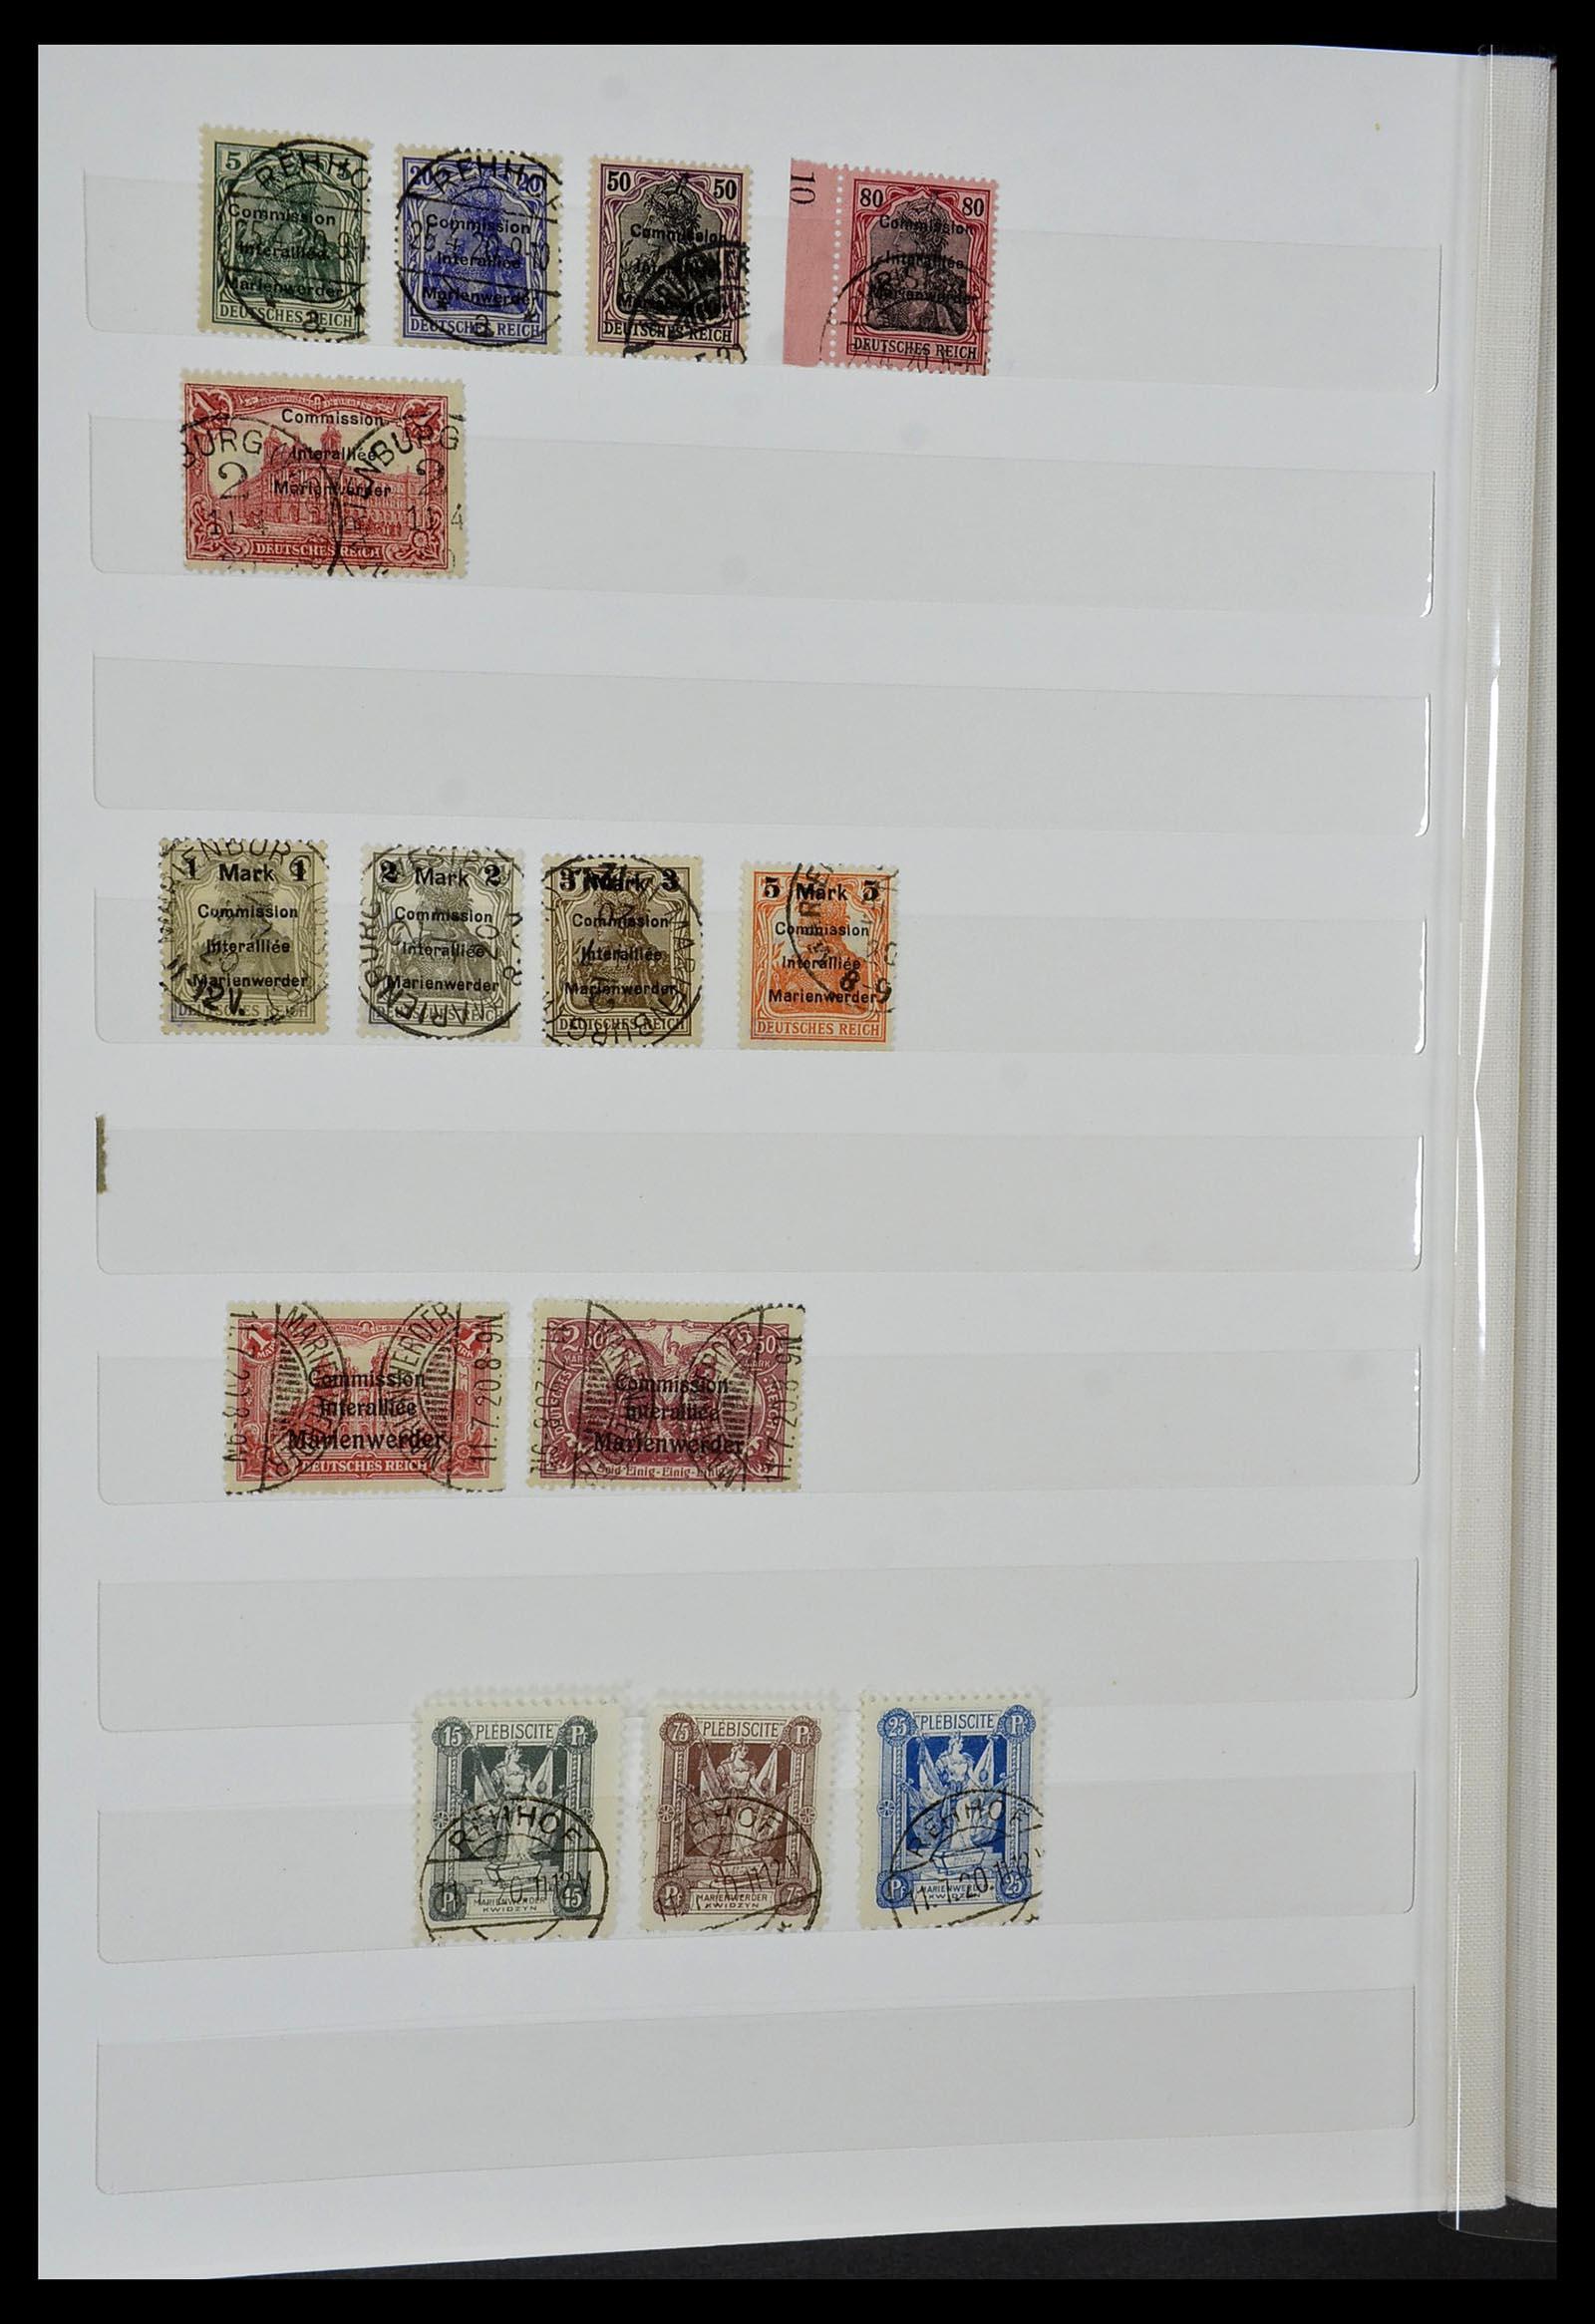 34069 020 - Postzegelverzameling 34069 Duitsland 1855-1952.